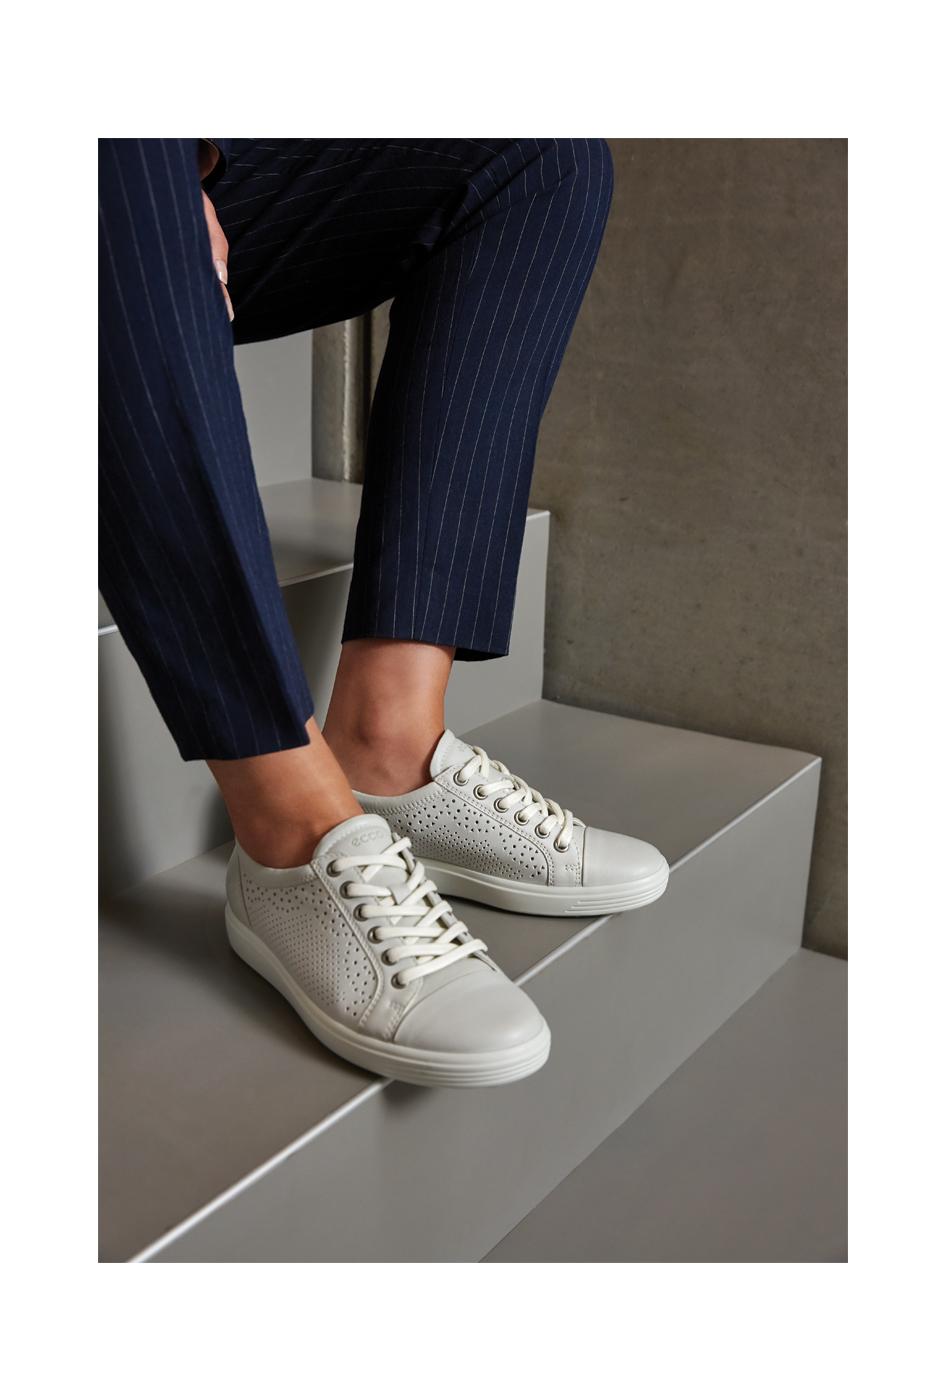 6228289dbb ECCO Shoes NZ Official Store | Buy Shoes Online - ECCO Shoes NZ